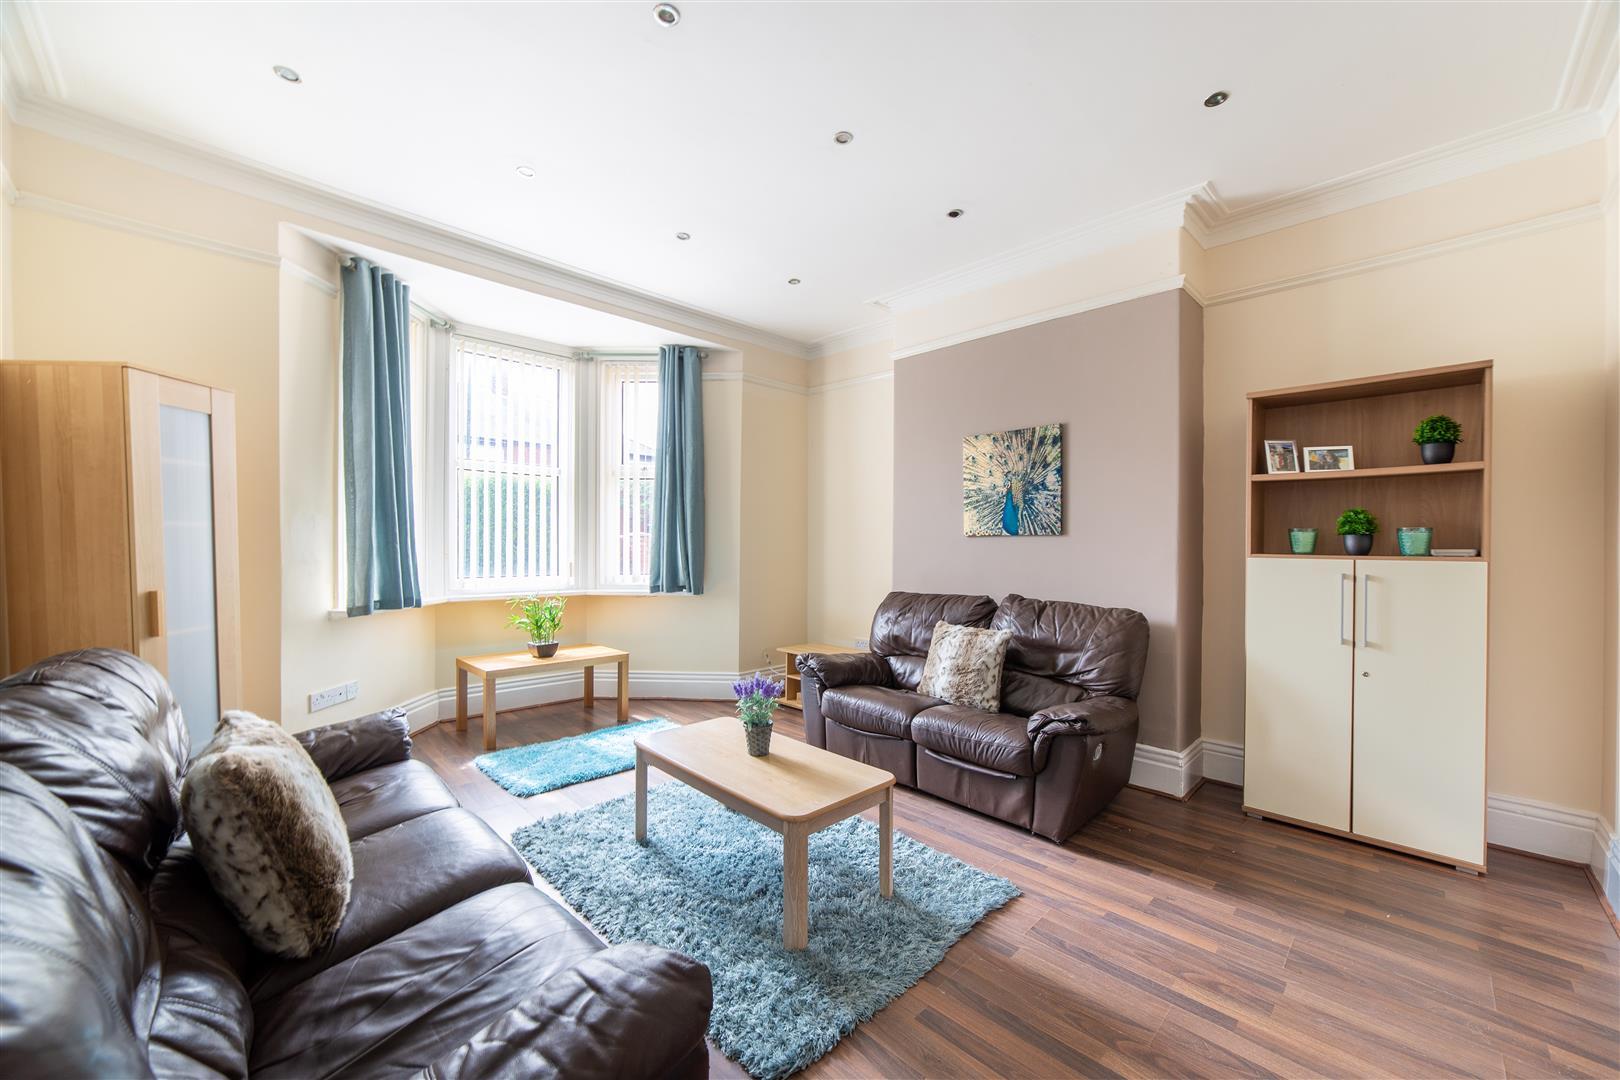 4 bed terraced house to rent in Rothbury Terrace, Heaton, NE6